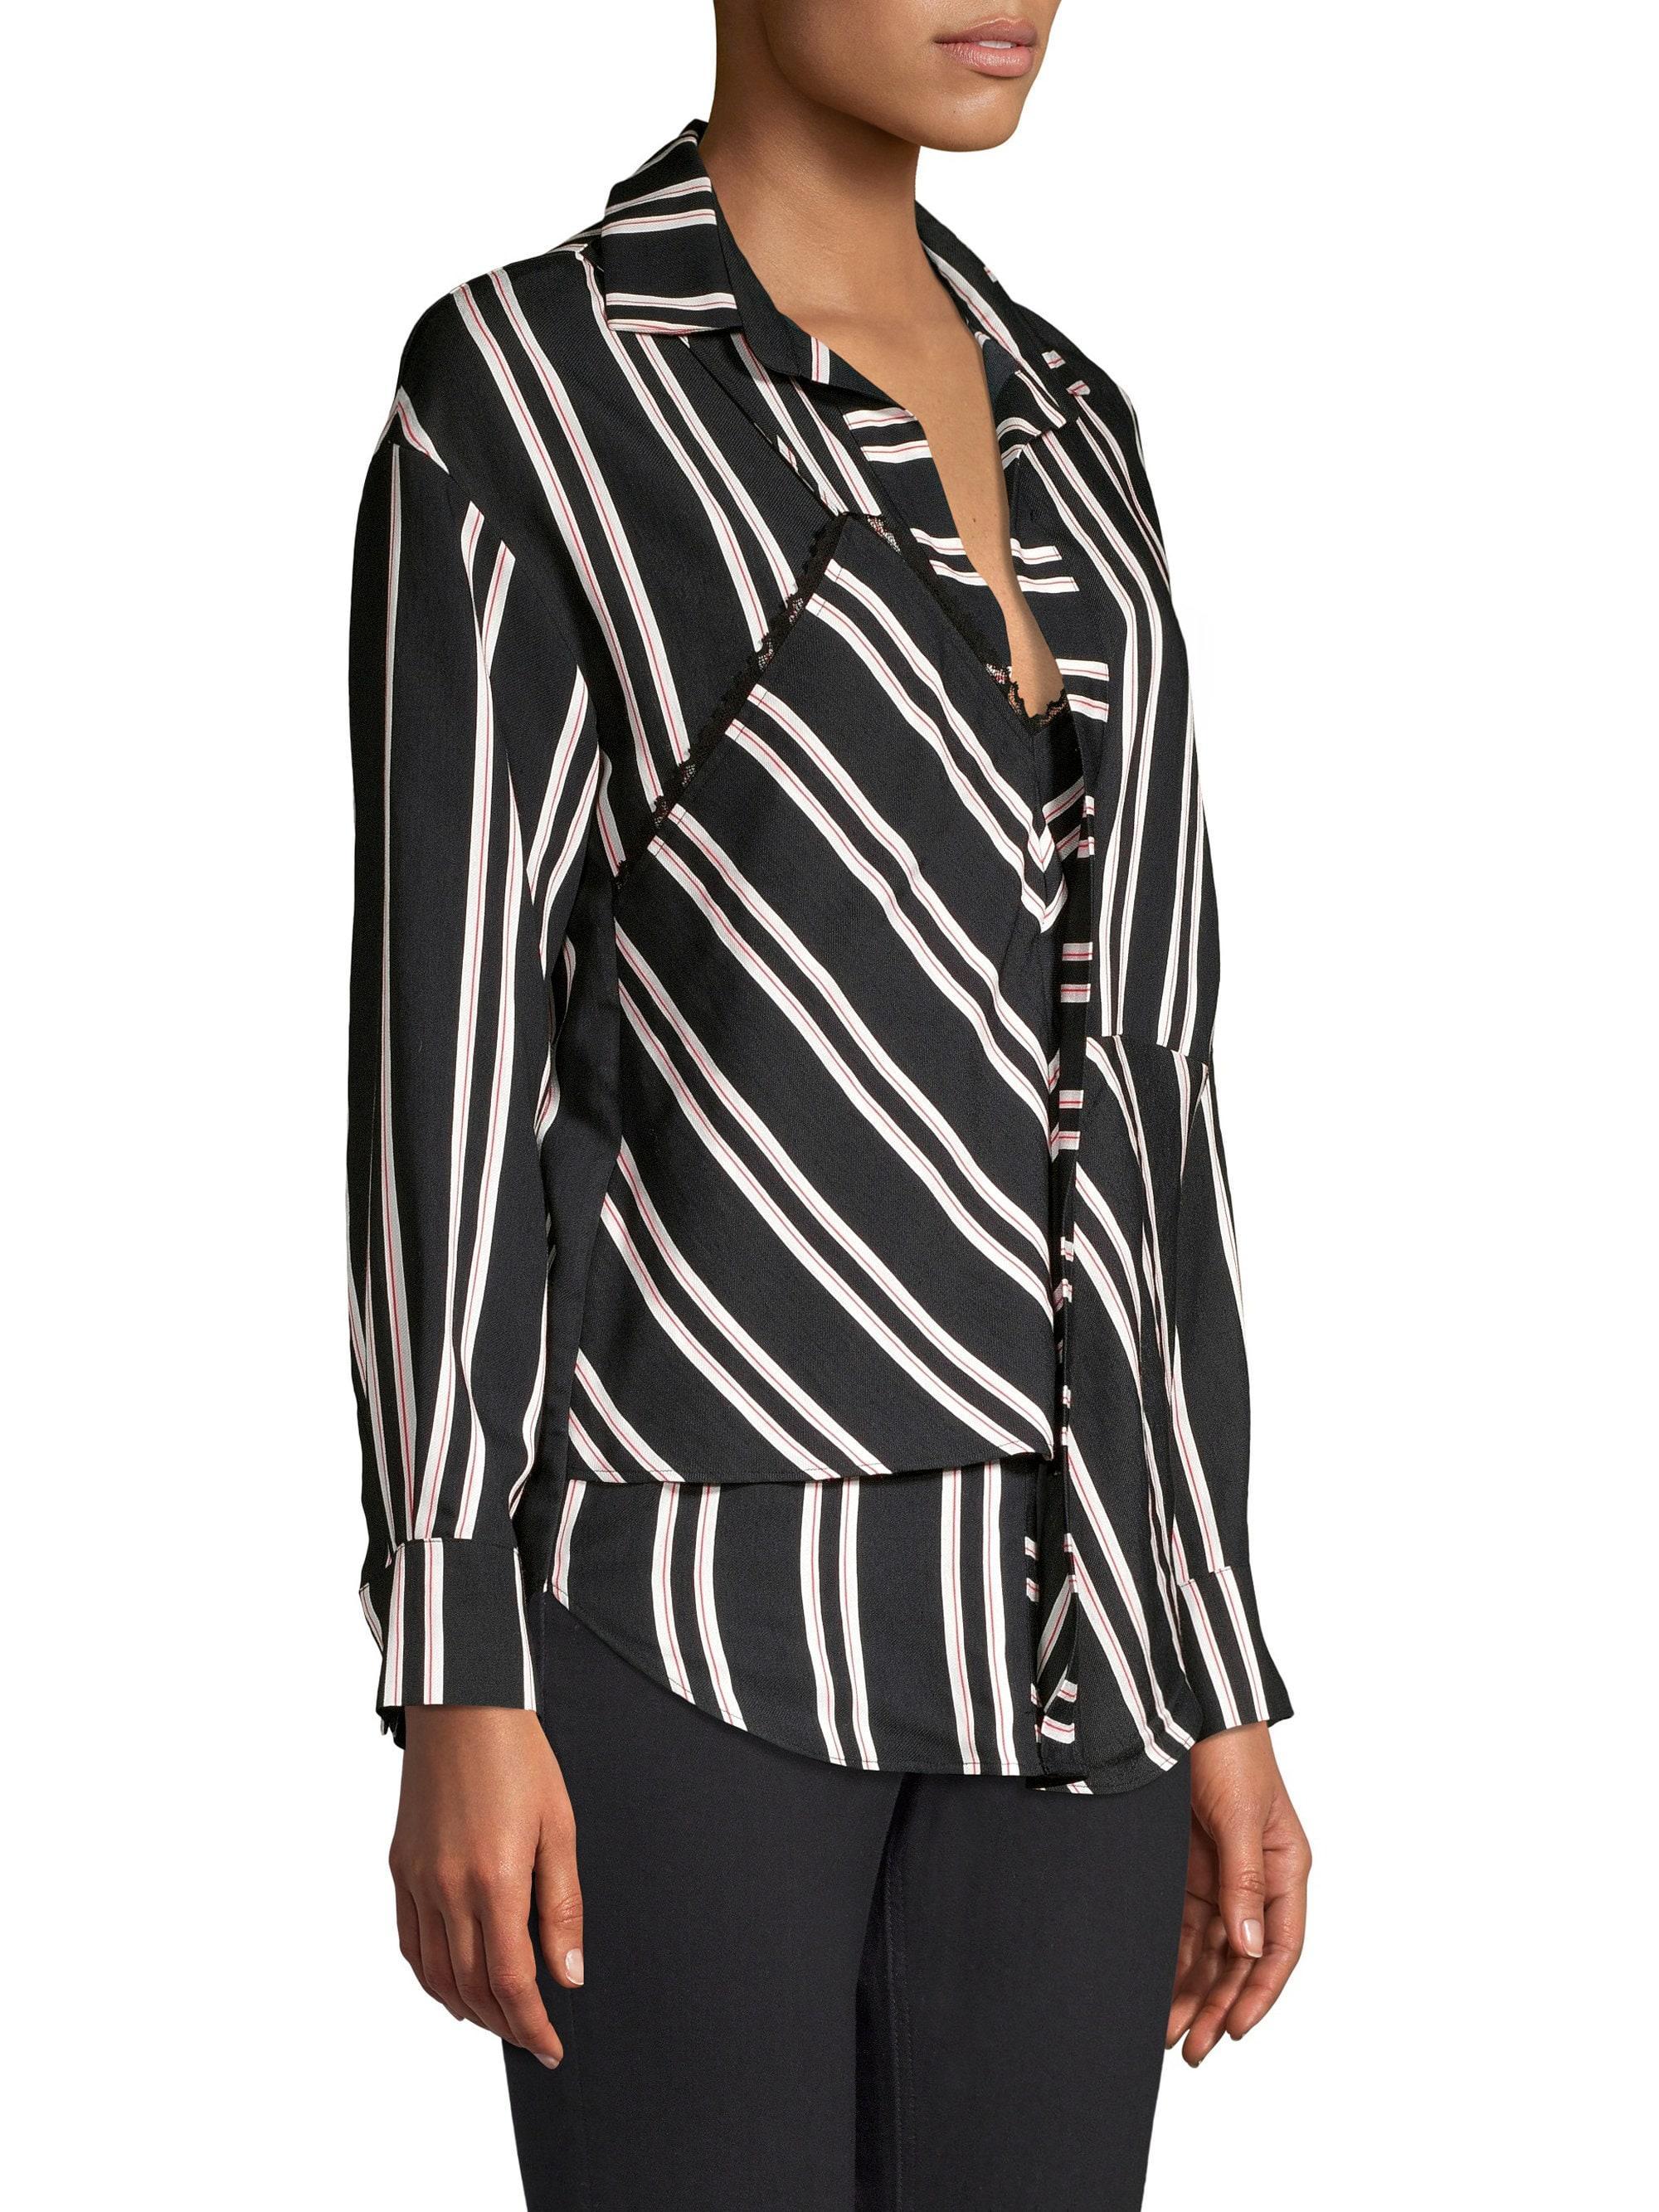 Maje Larencia Striped Trompe Loeil Collared Shirt in